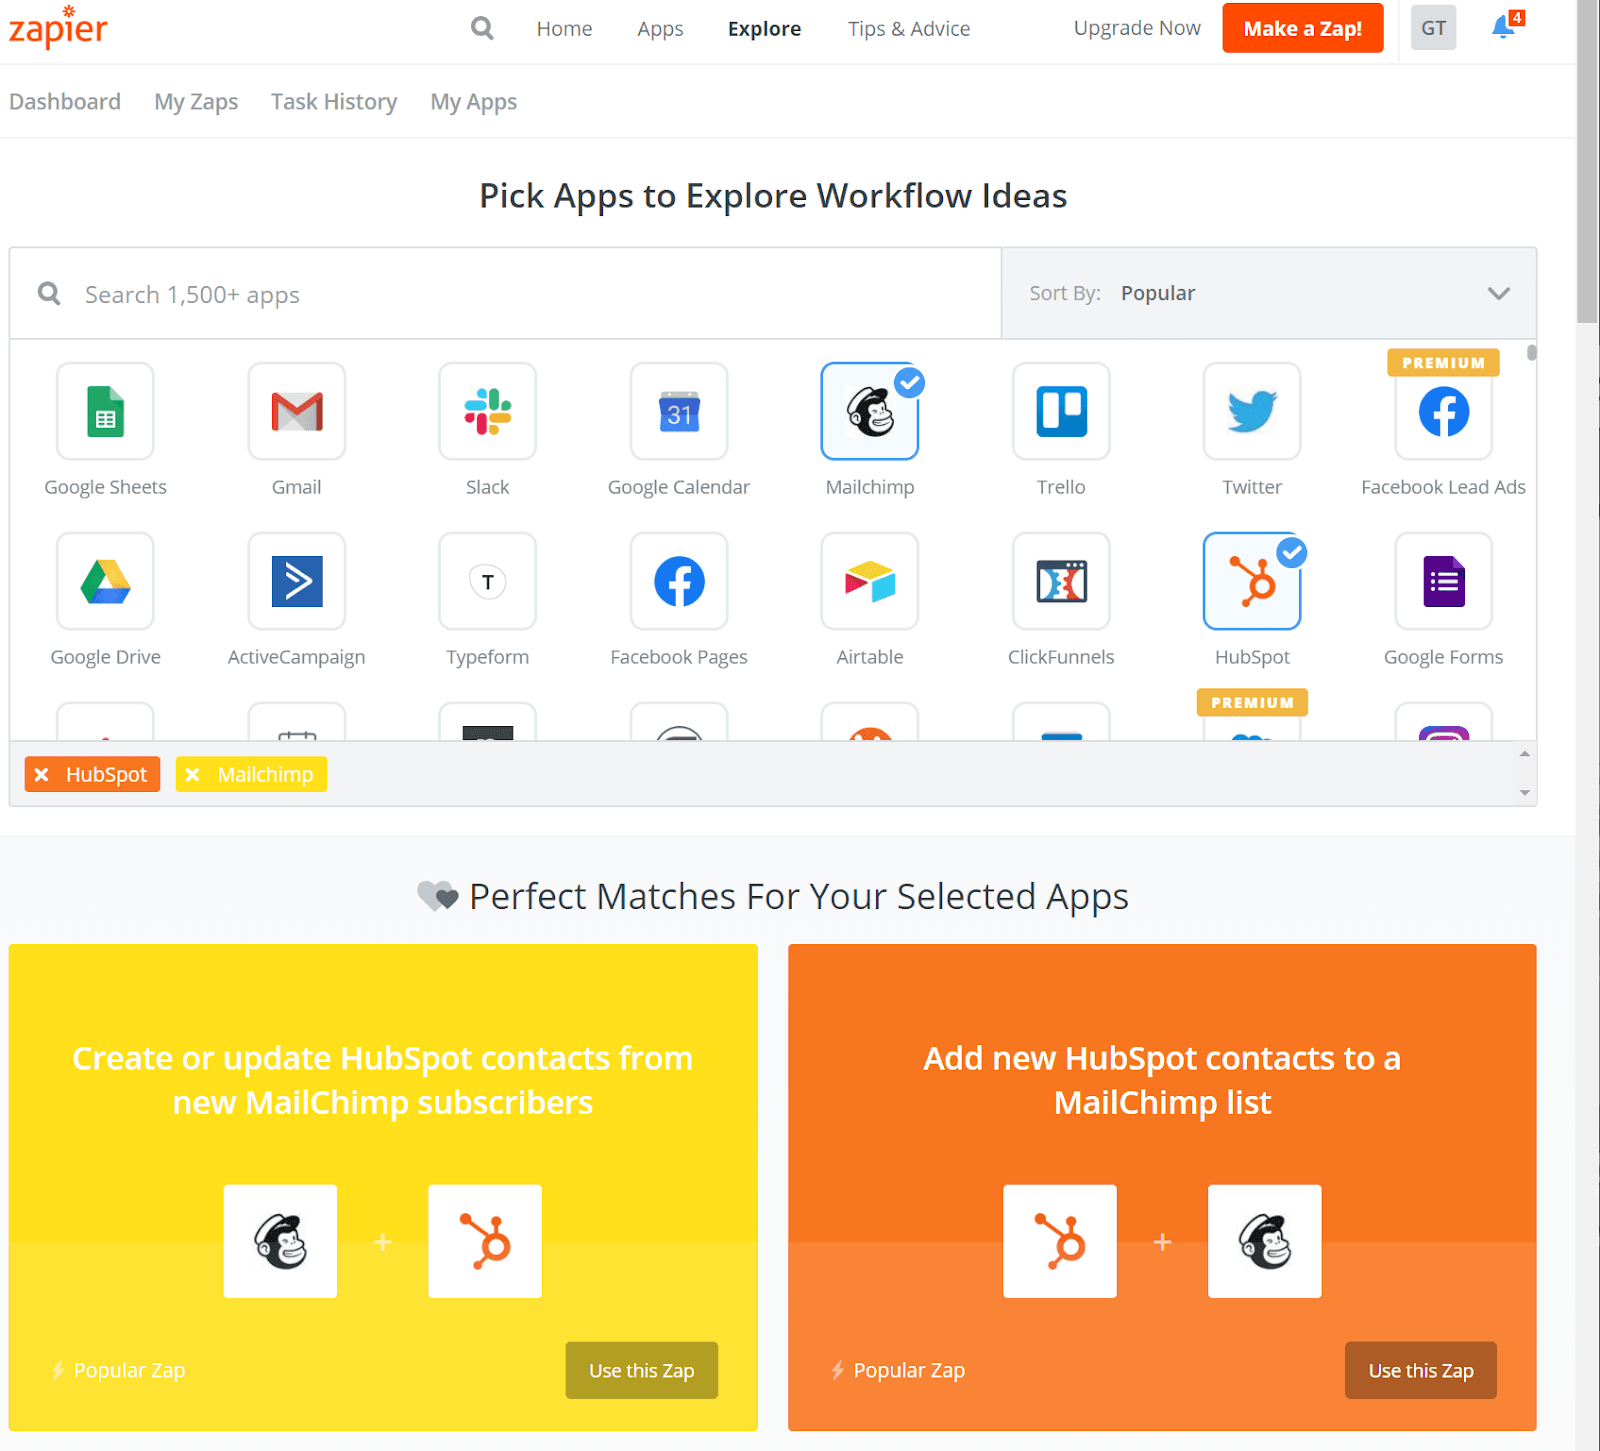 Zapier integration app suggestions